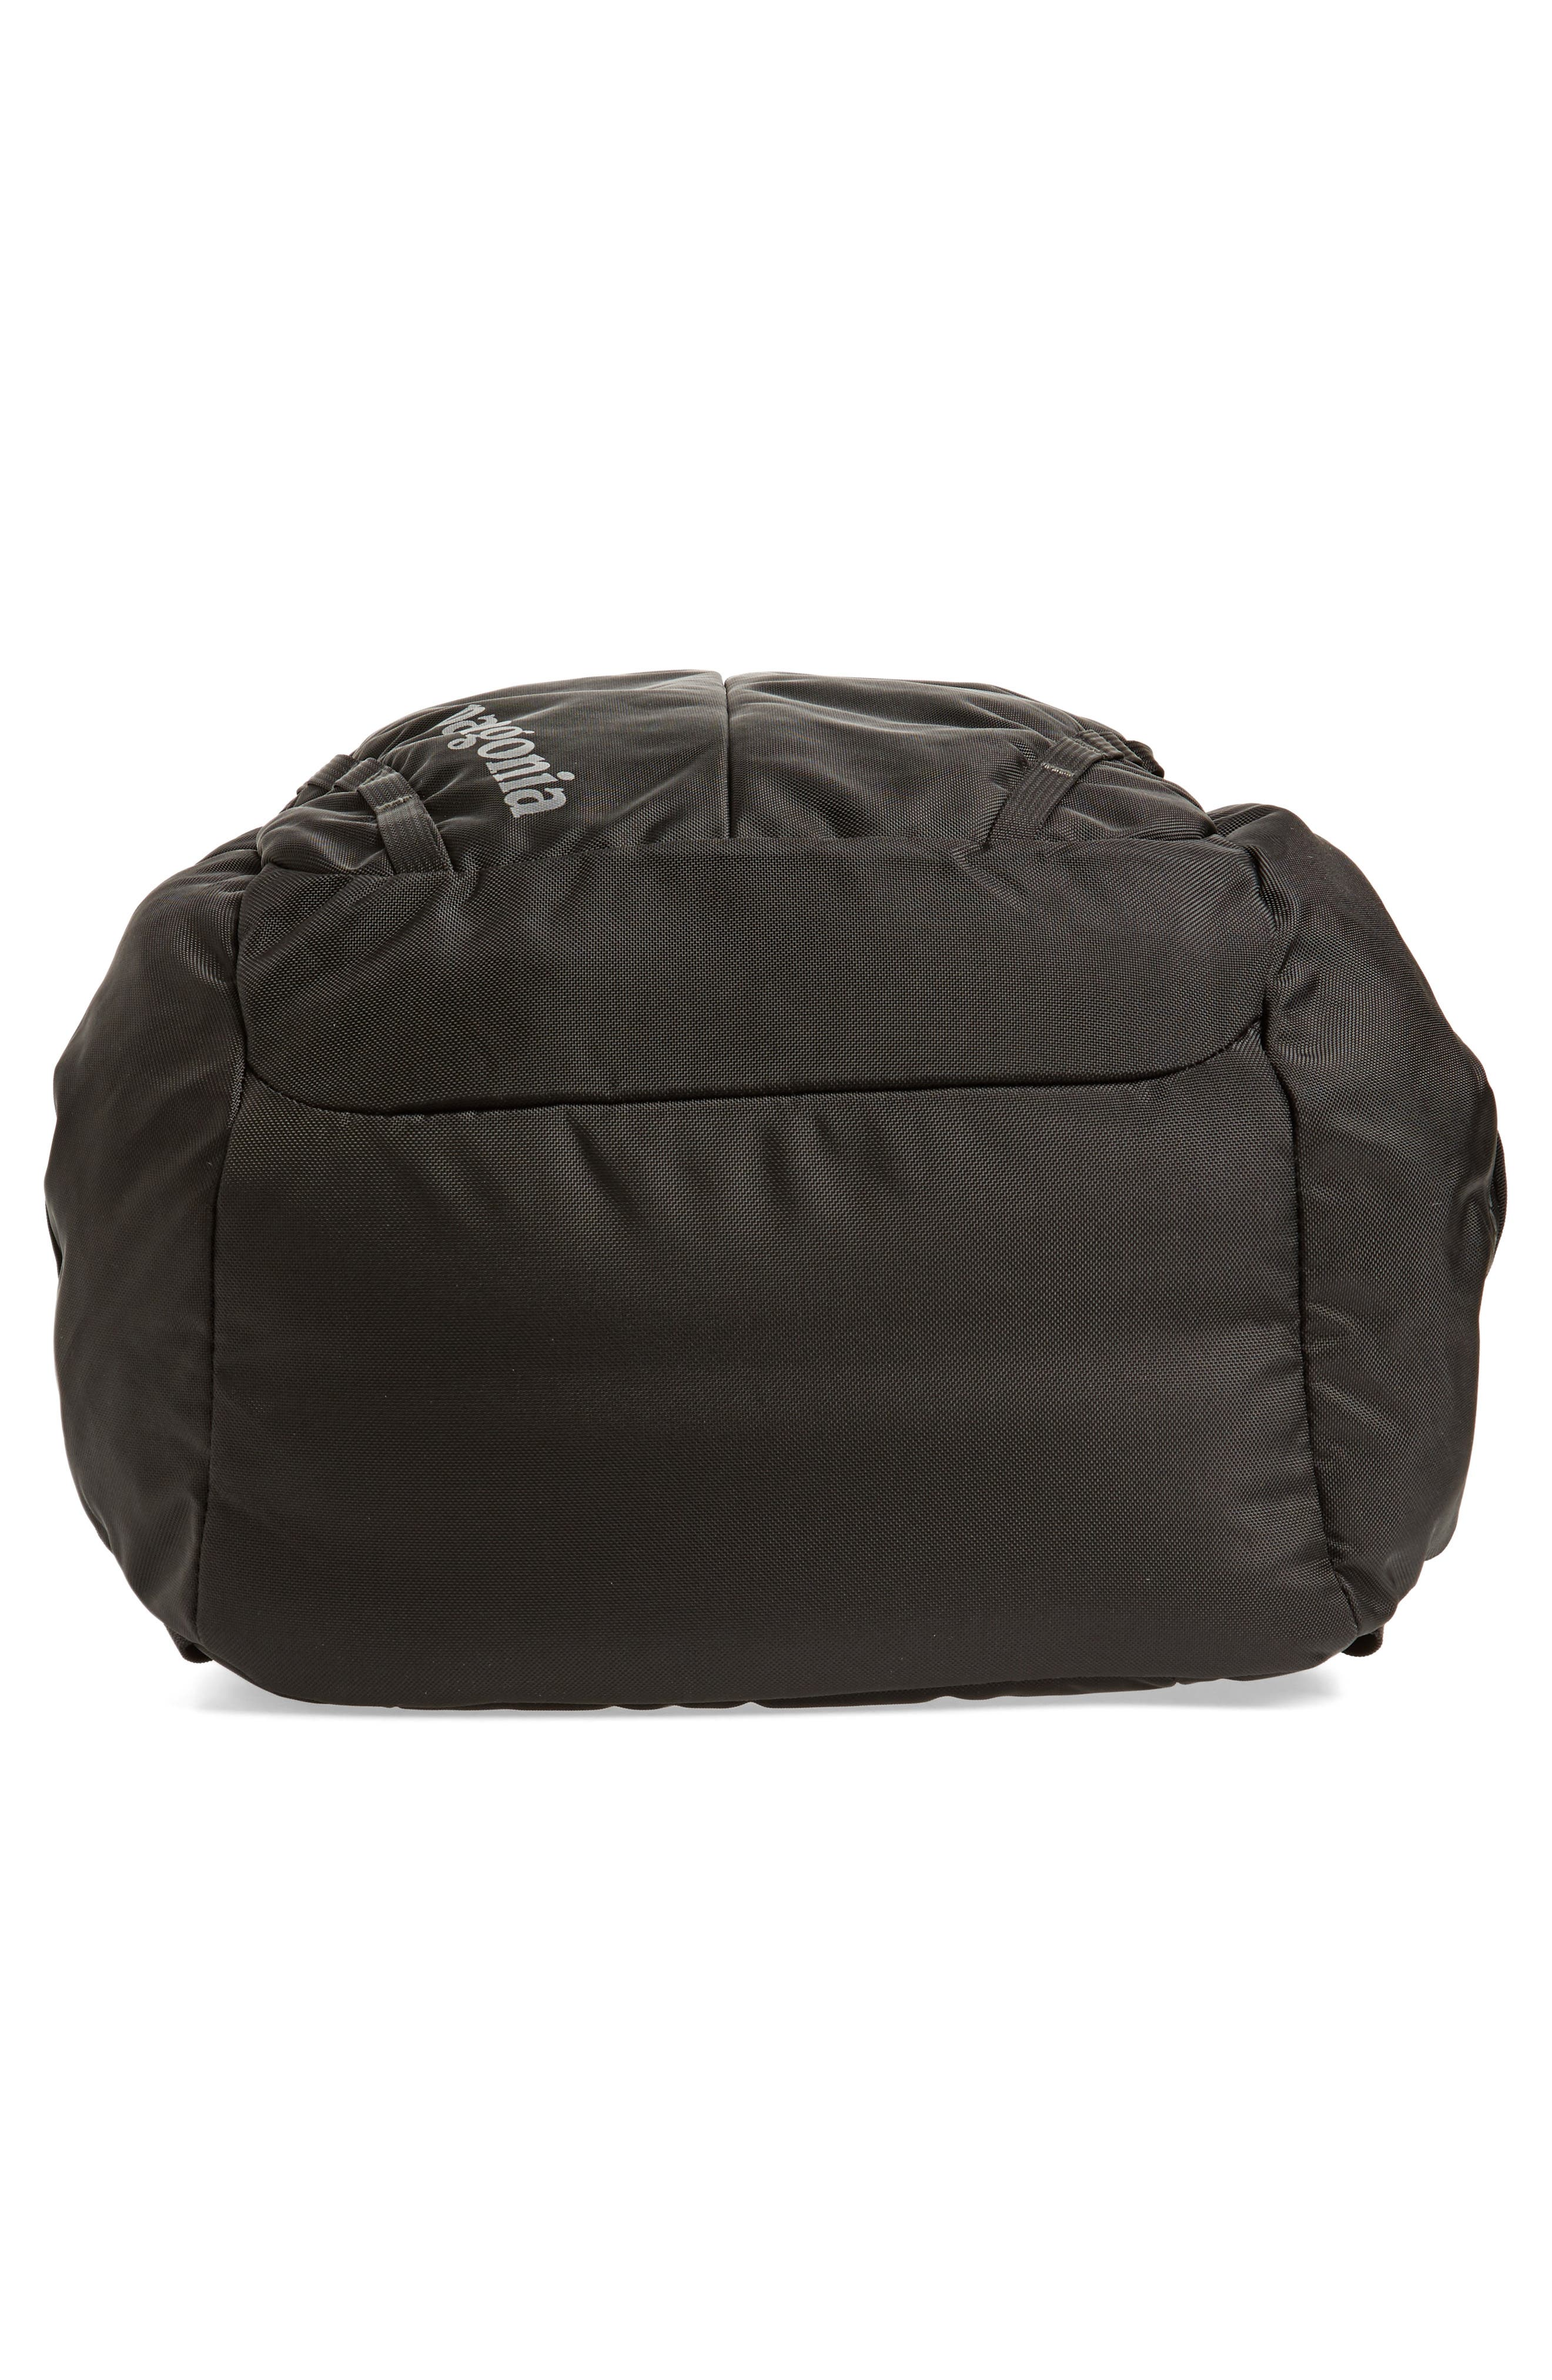 PATAGONIA, Refugio 28-Liter Backpack, Alternate thumbnail 7, color, 001